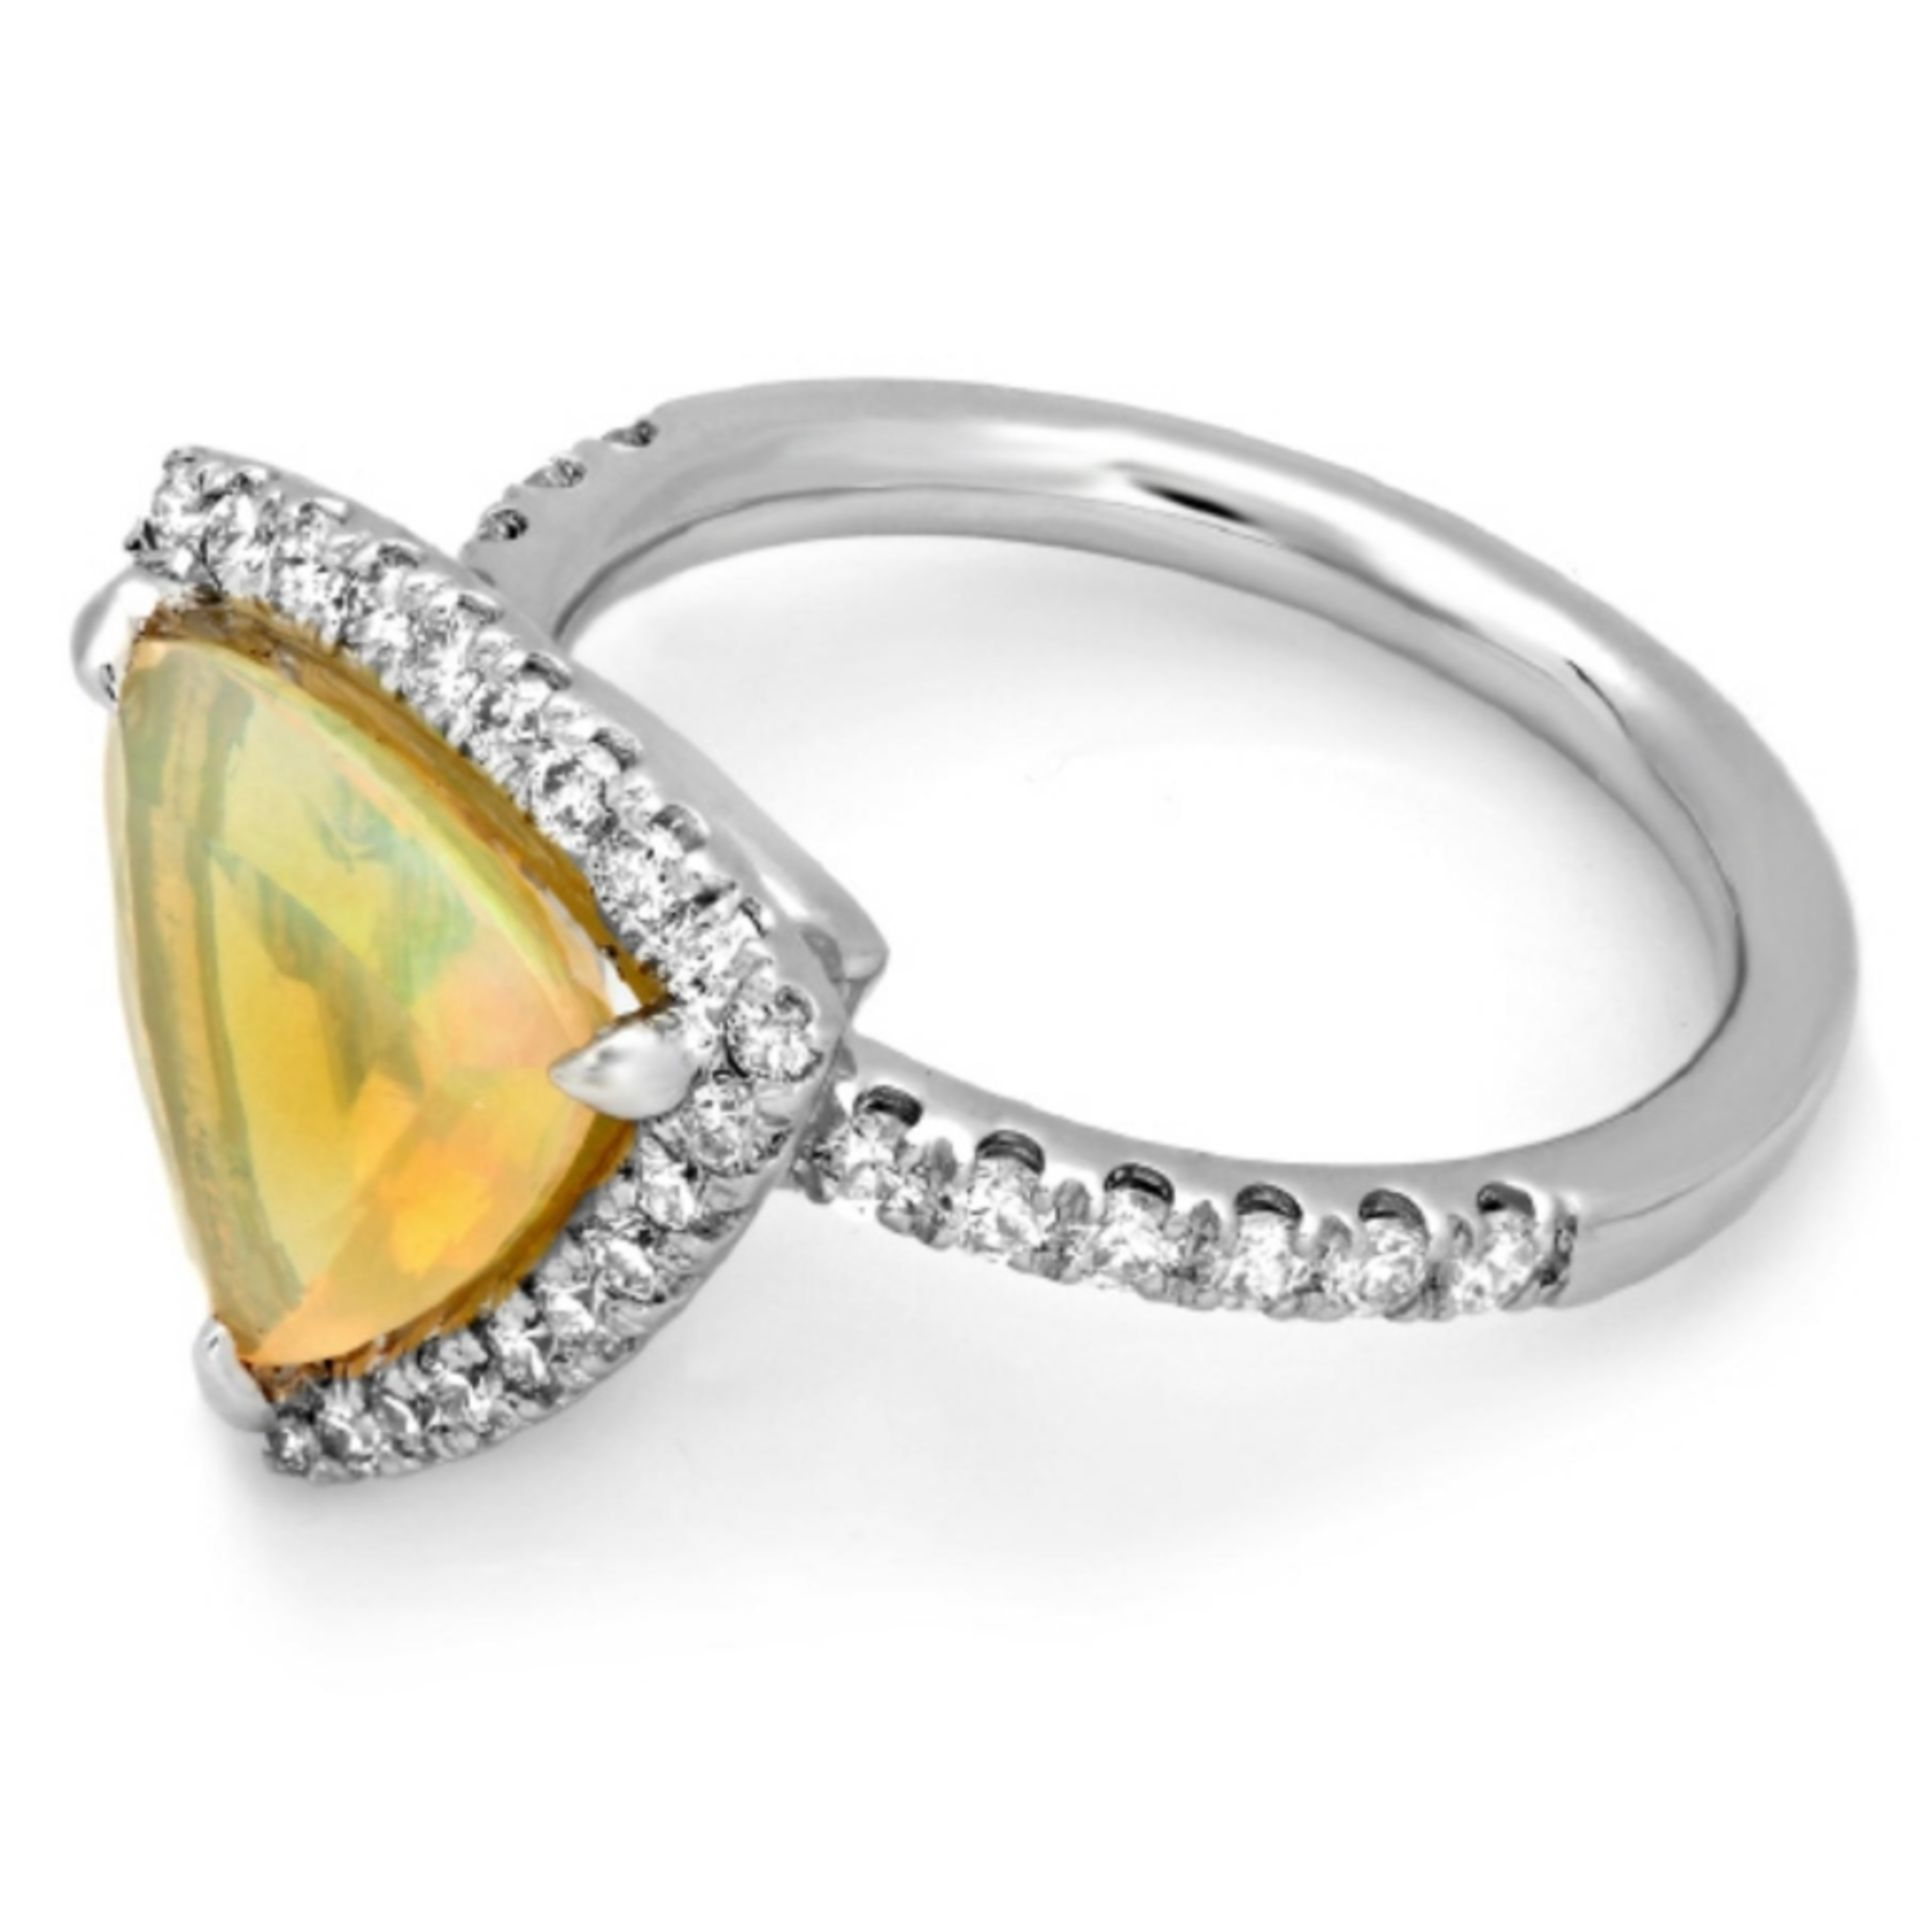 14K Gold 2.00ct Opal & 0.60ct Diamond Ring - Image 2 of 2